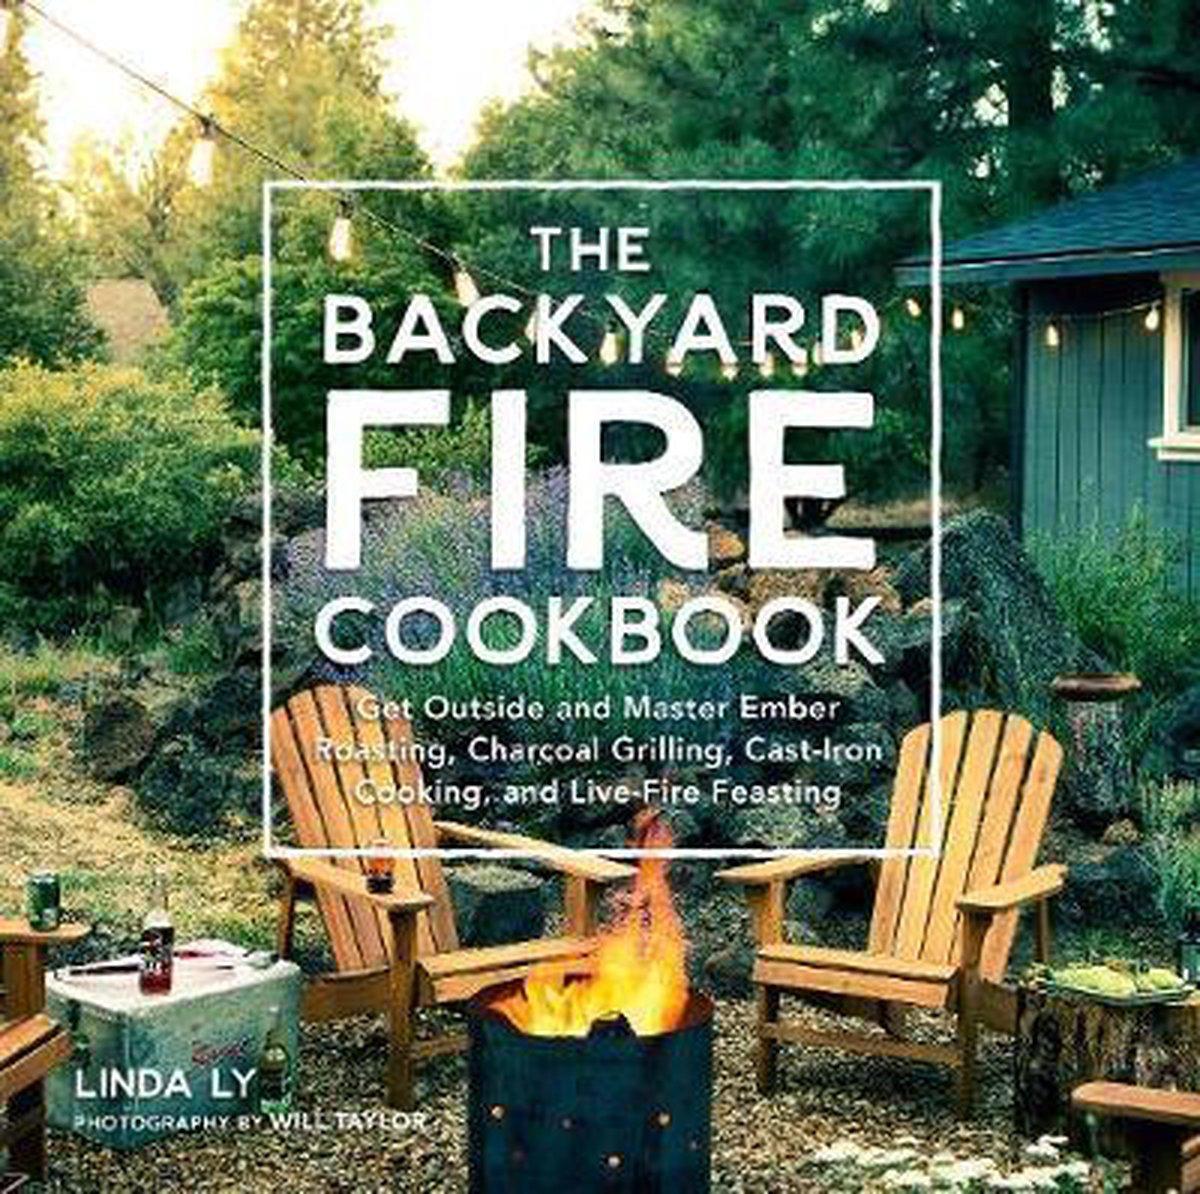 Light your own fire | Outdoor bbq, Backyard, Outdoor pizza